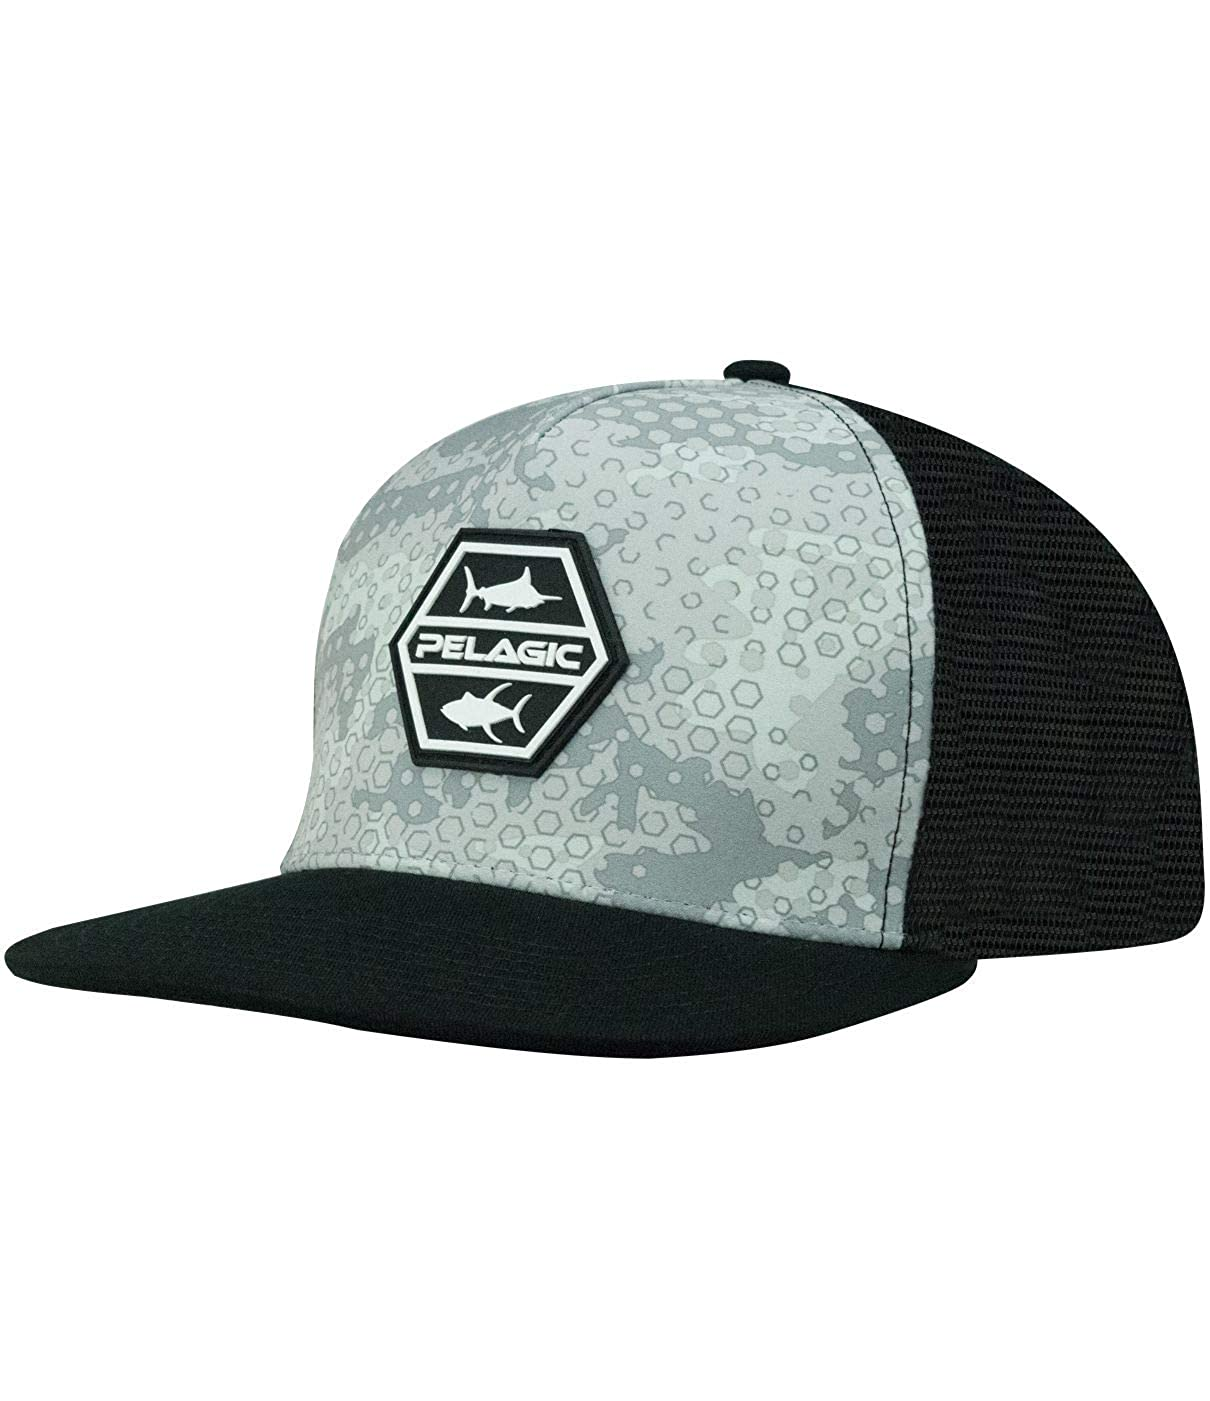 21ebeaaaa Amazon.com: Pelagic Men's Alpha Snapback Fishing Hat | Ambush Camo ...